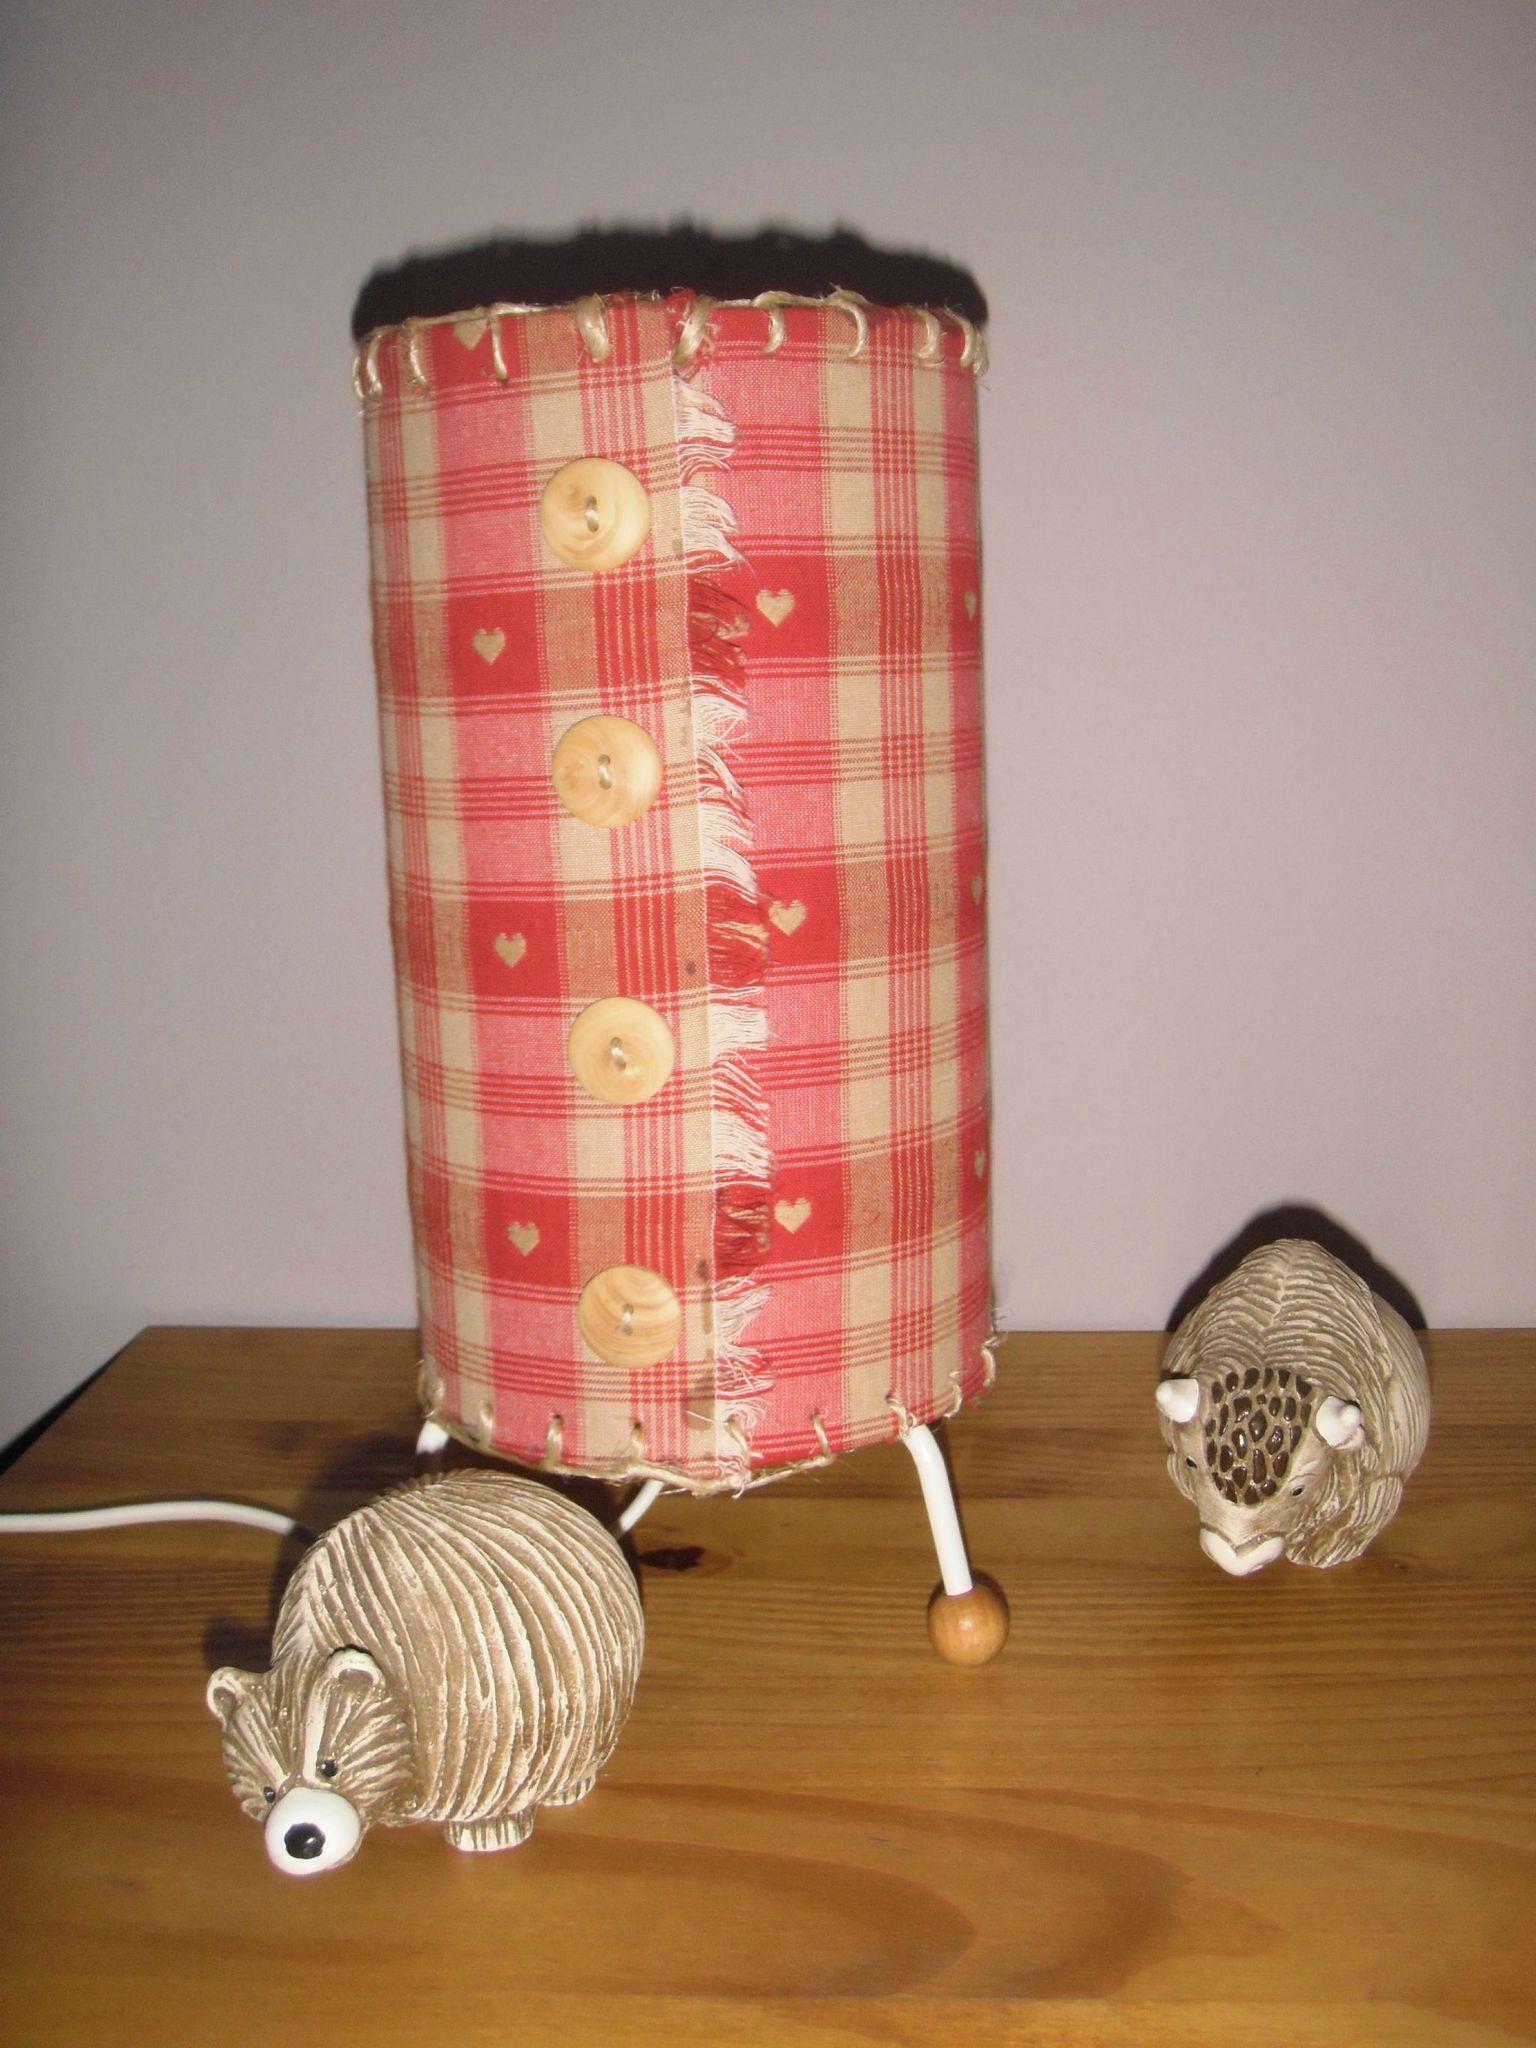 lampe poser chalet v lumine cr ation luminaire eco con u. Black Bedroom Furniture Sets. Home Design Ideas